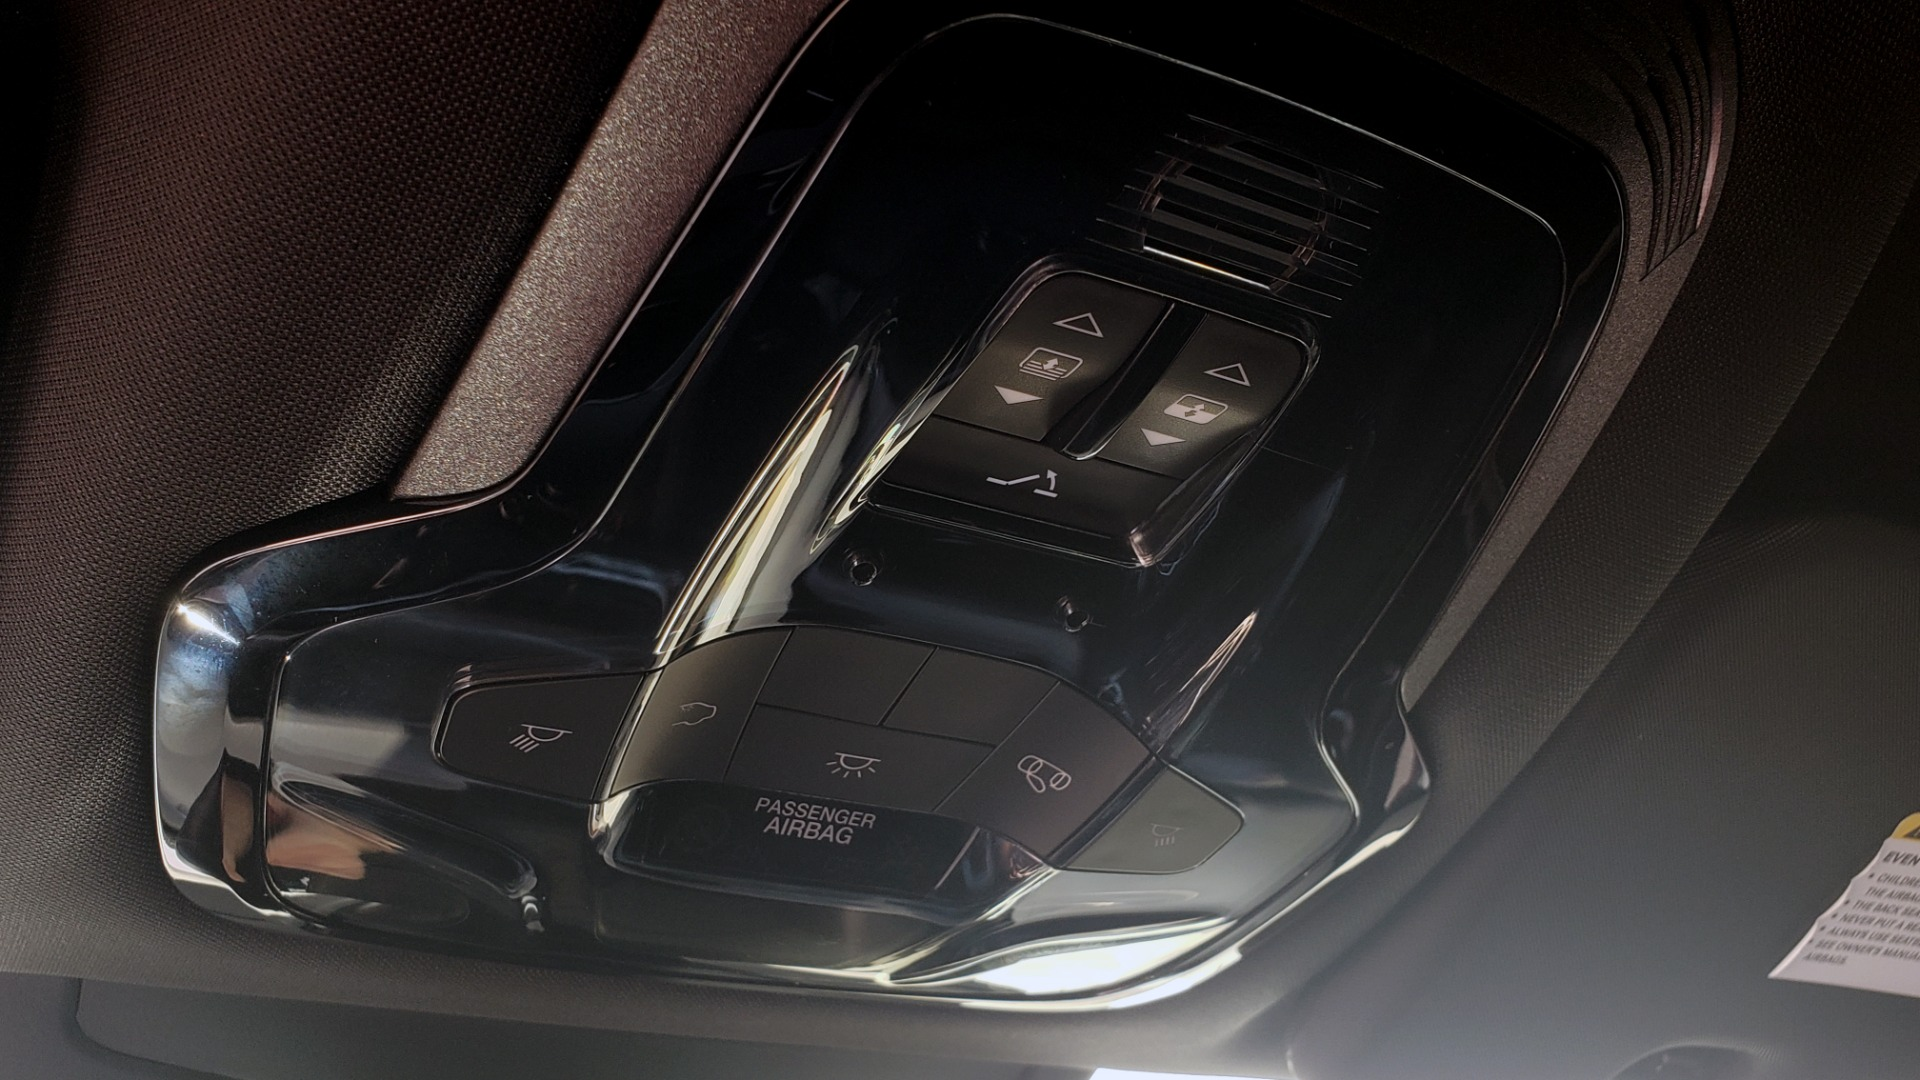 Used 2019 Alfa Romeo STELVIO TI SPORT AWD / 2.0L TURBO / 8-SPD AUTO / DRVR ASST / REARVIEW for sale $37,495 at Formula Imports in Charlotte NC 28227 60